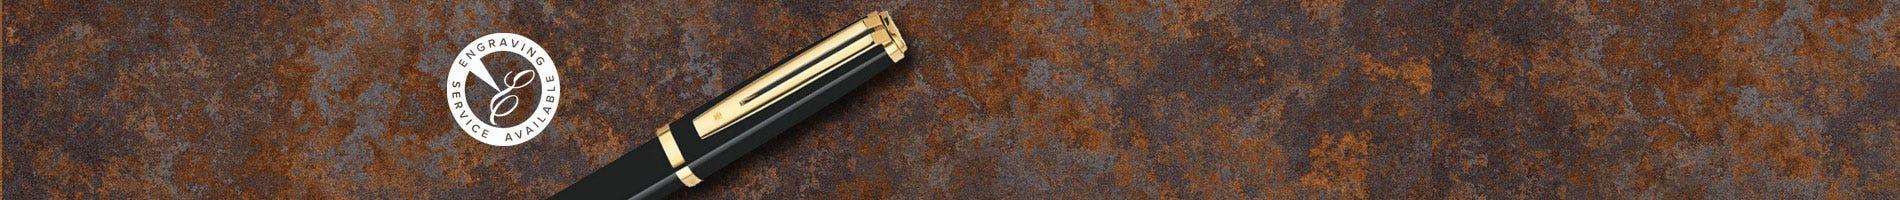 Waterman Carene deluxe fountain pen